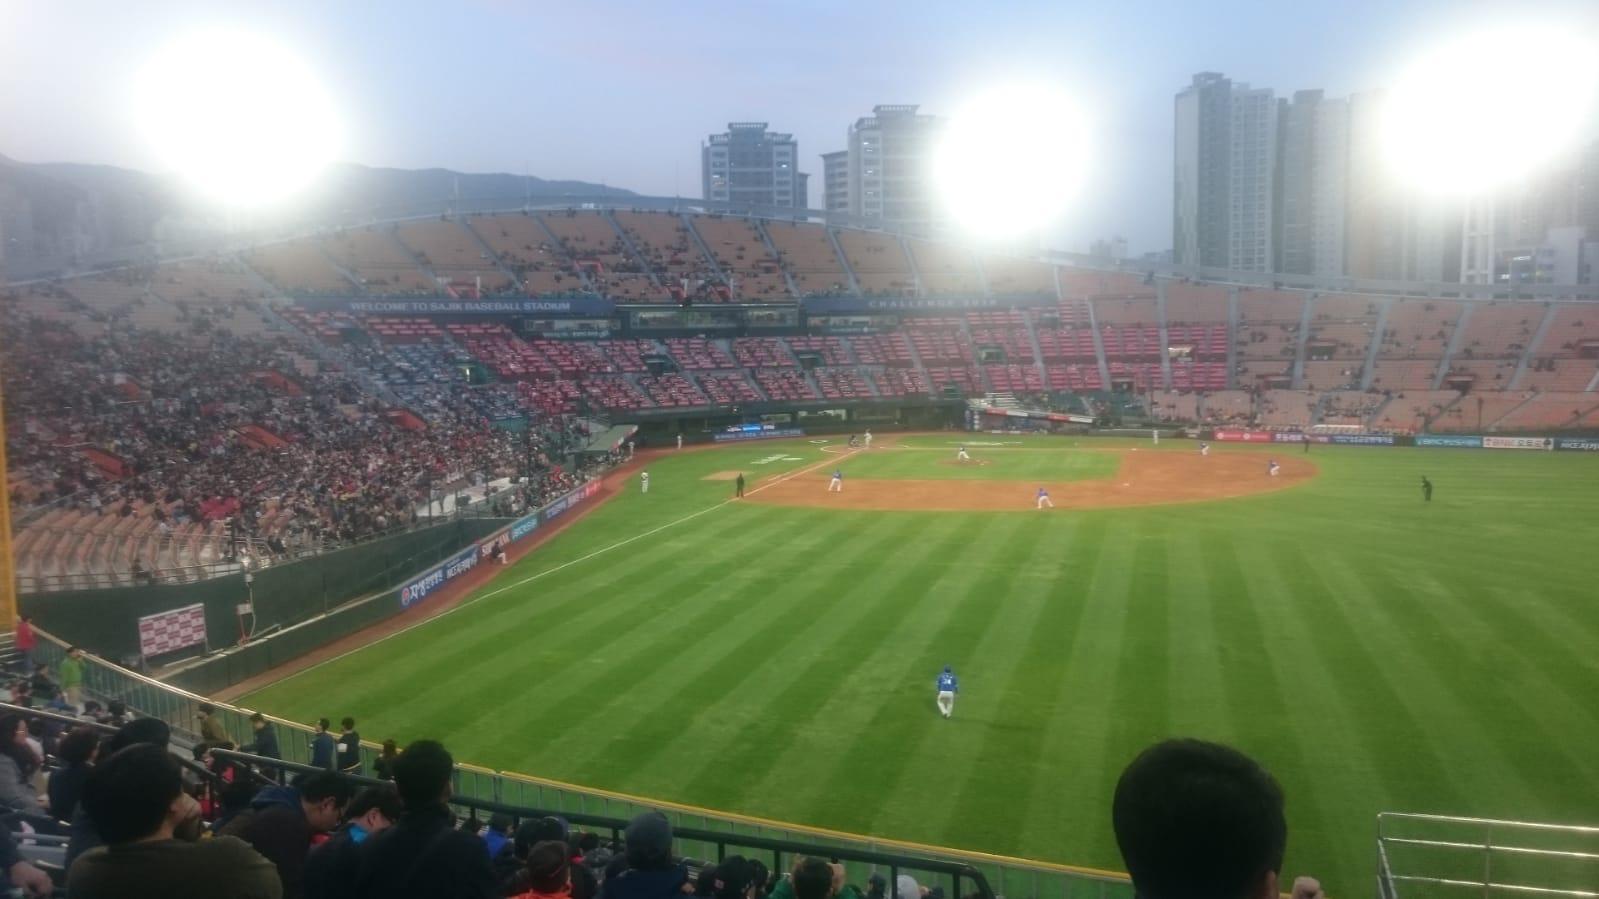 Reisetagebuch Elena und Mateo - Baseball - Lotte Giants Busan